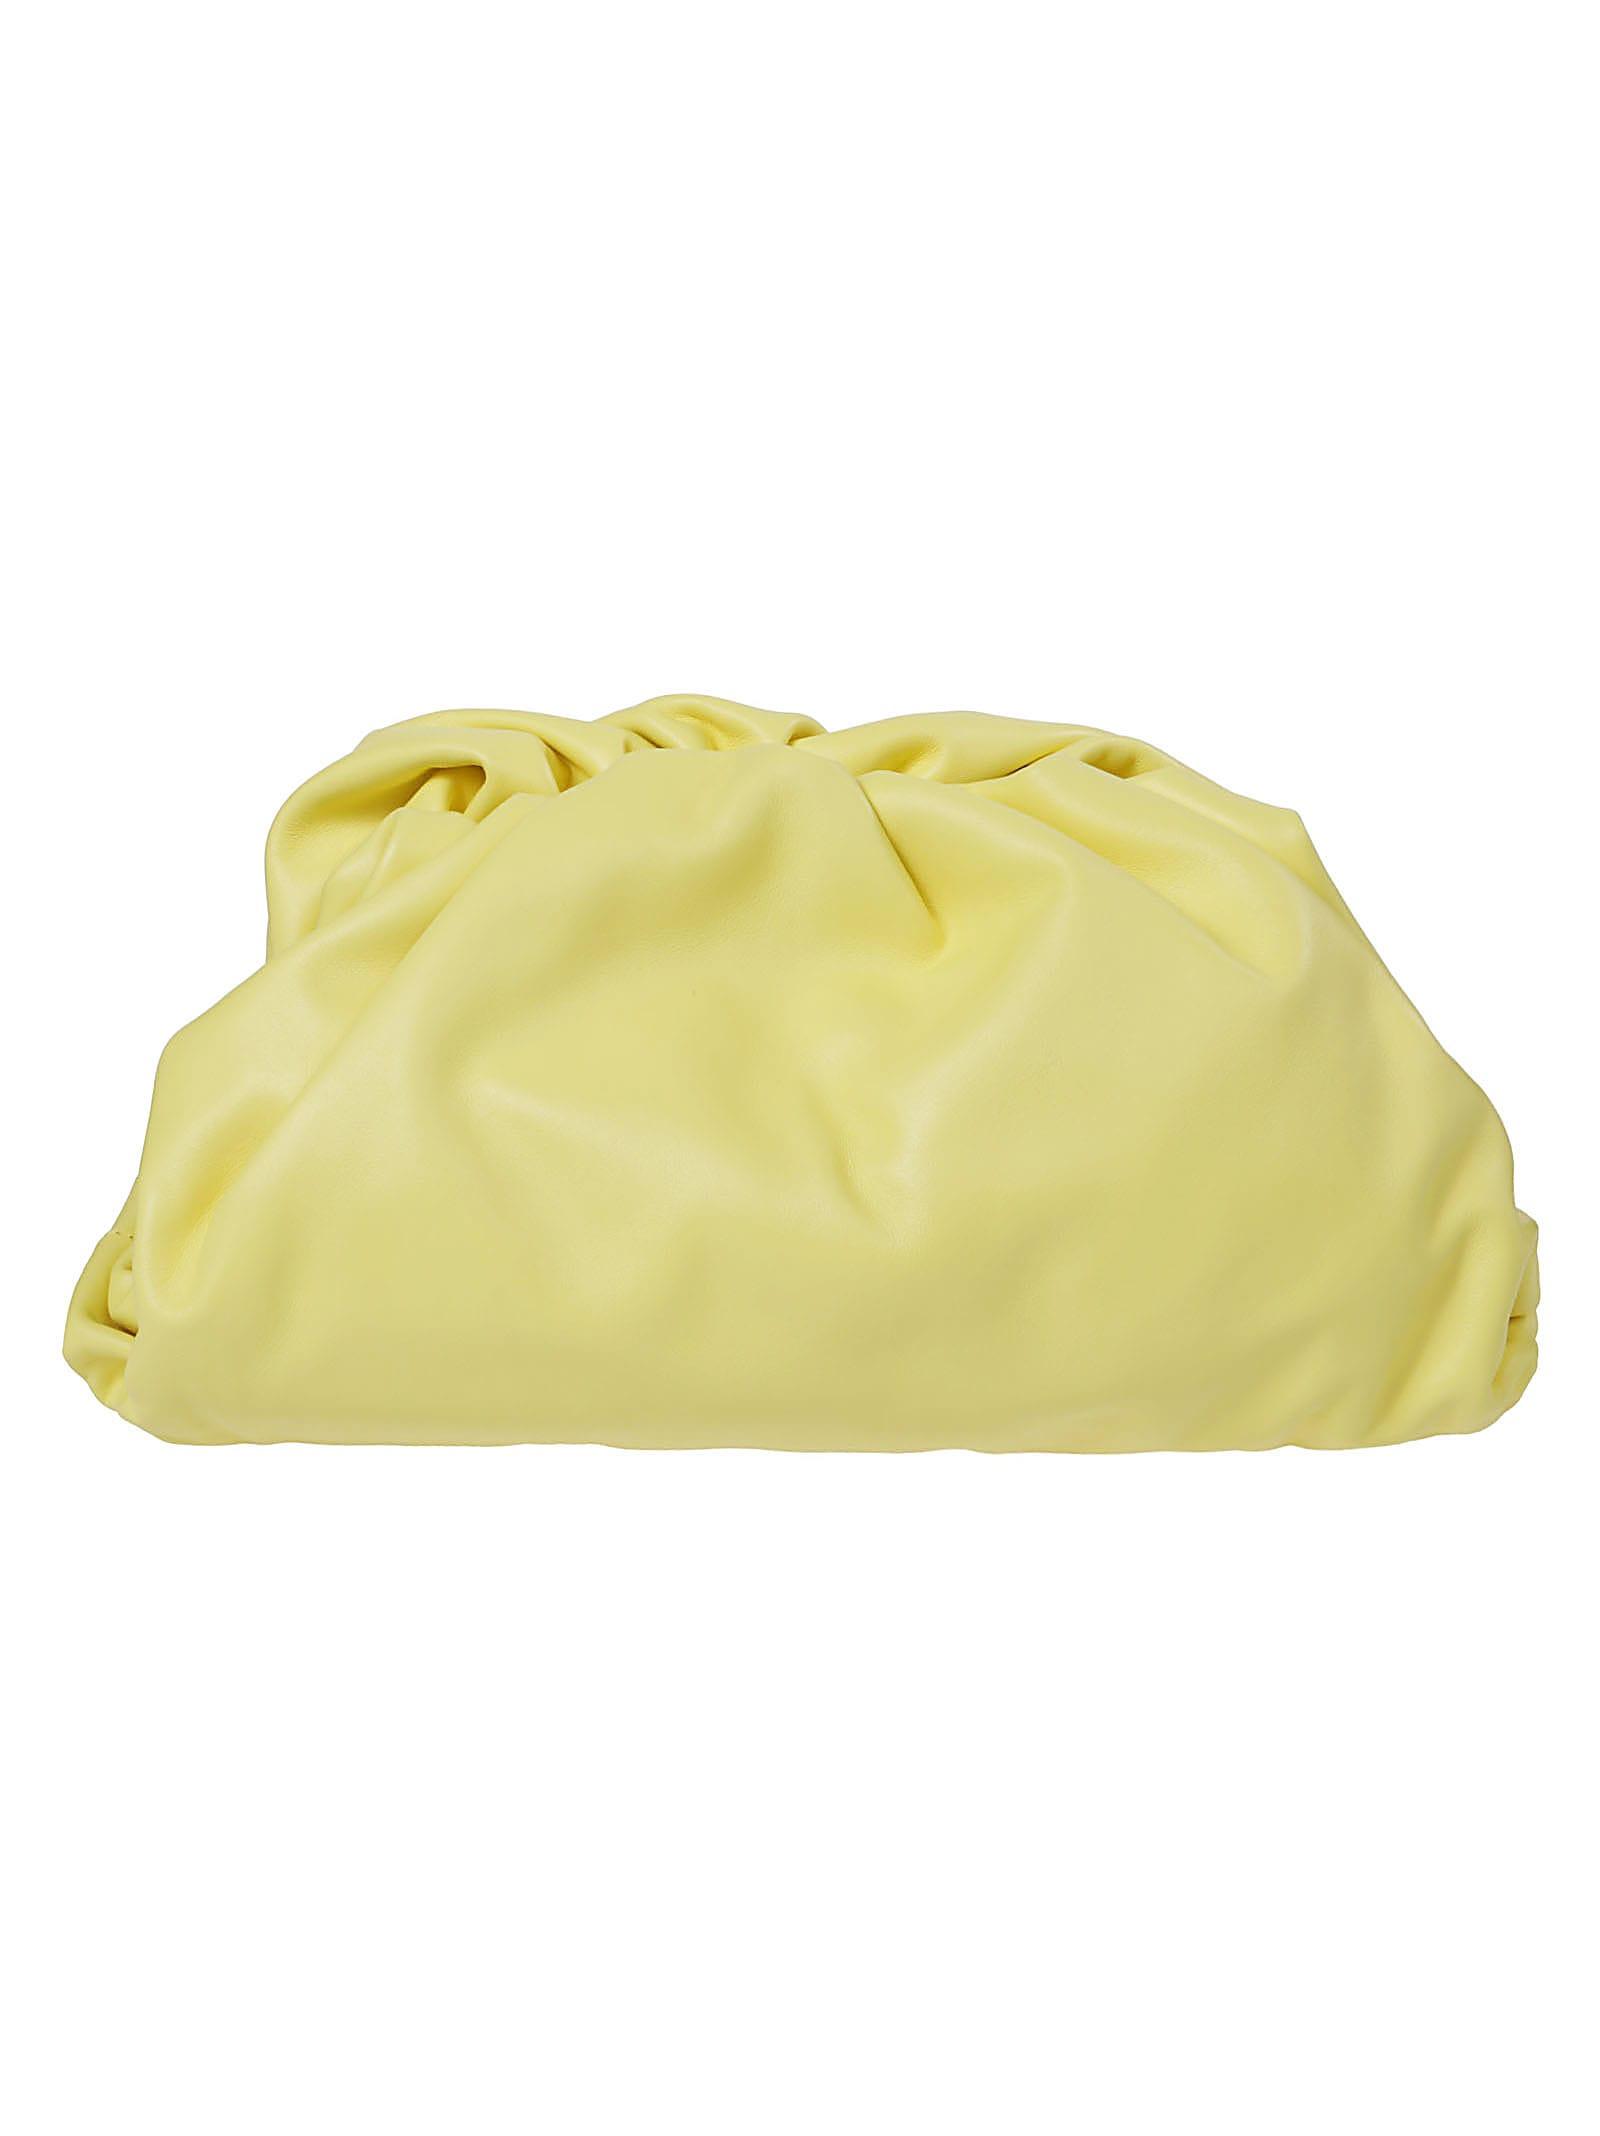 Bottega Veneta The Pouch Clutch Bag